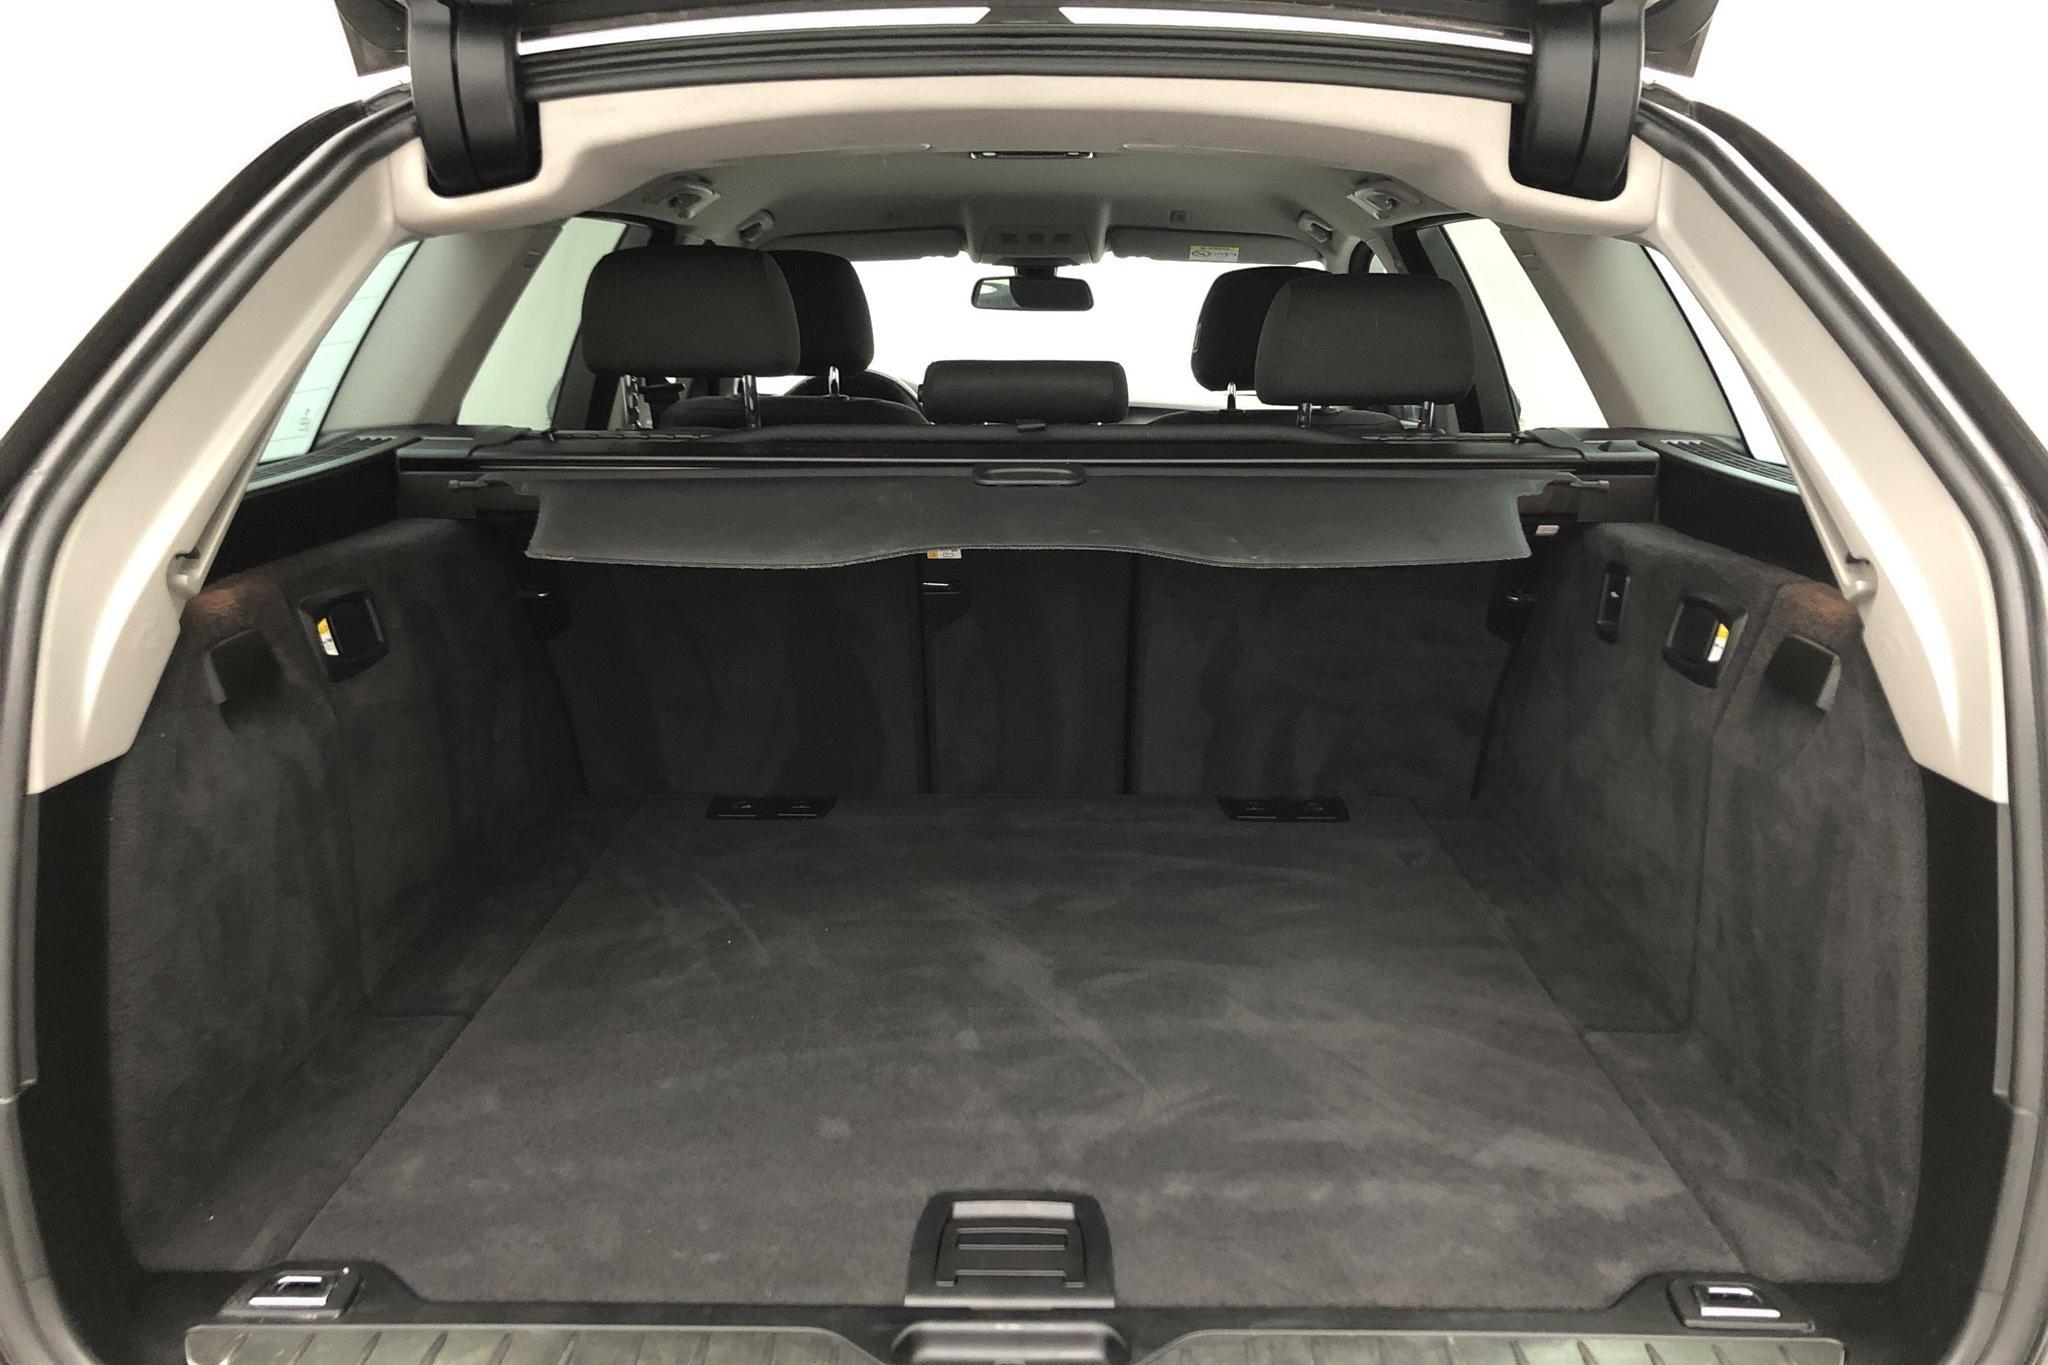 BMW 525d xDrive Touring, F11 (218hk) - 6 960 mil - Automat - brun - 2014